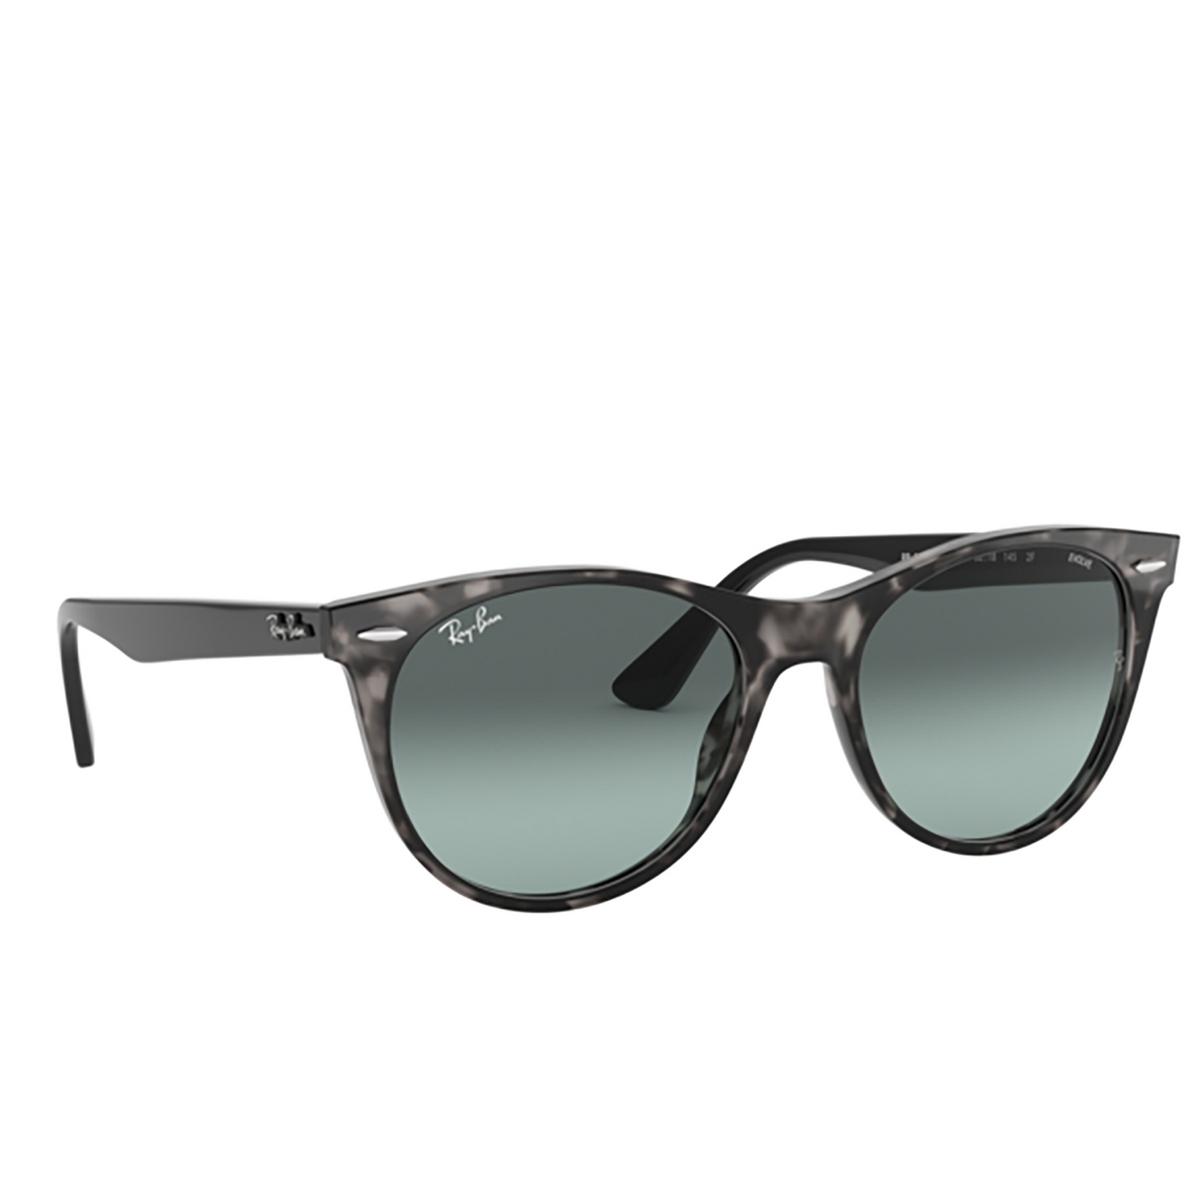 Ray-Ban® Square Sunglasses: Wayfarer Ii RB2185 color Grey Havana 1250AD - three-quarters view.